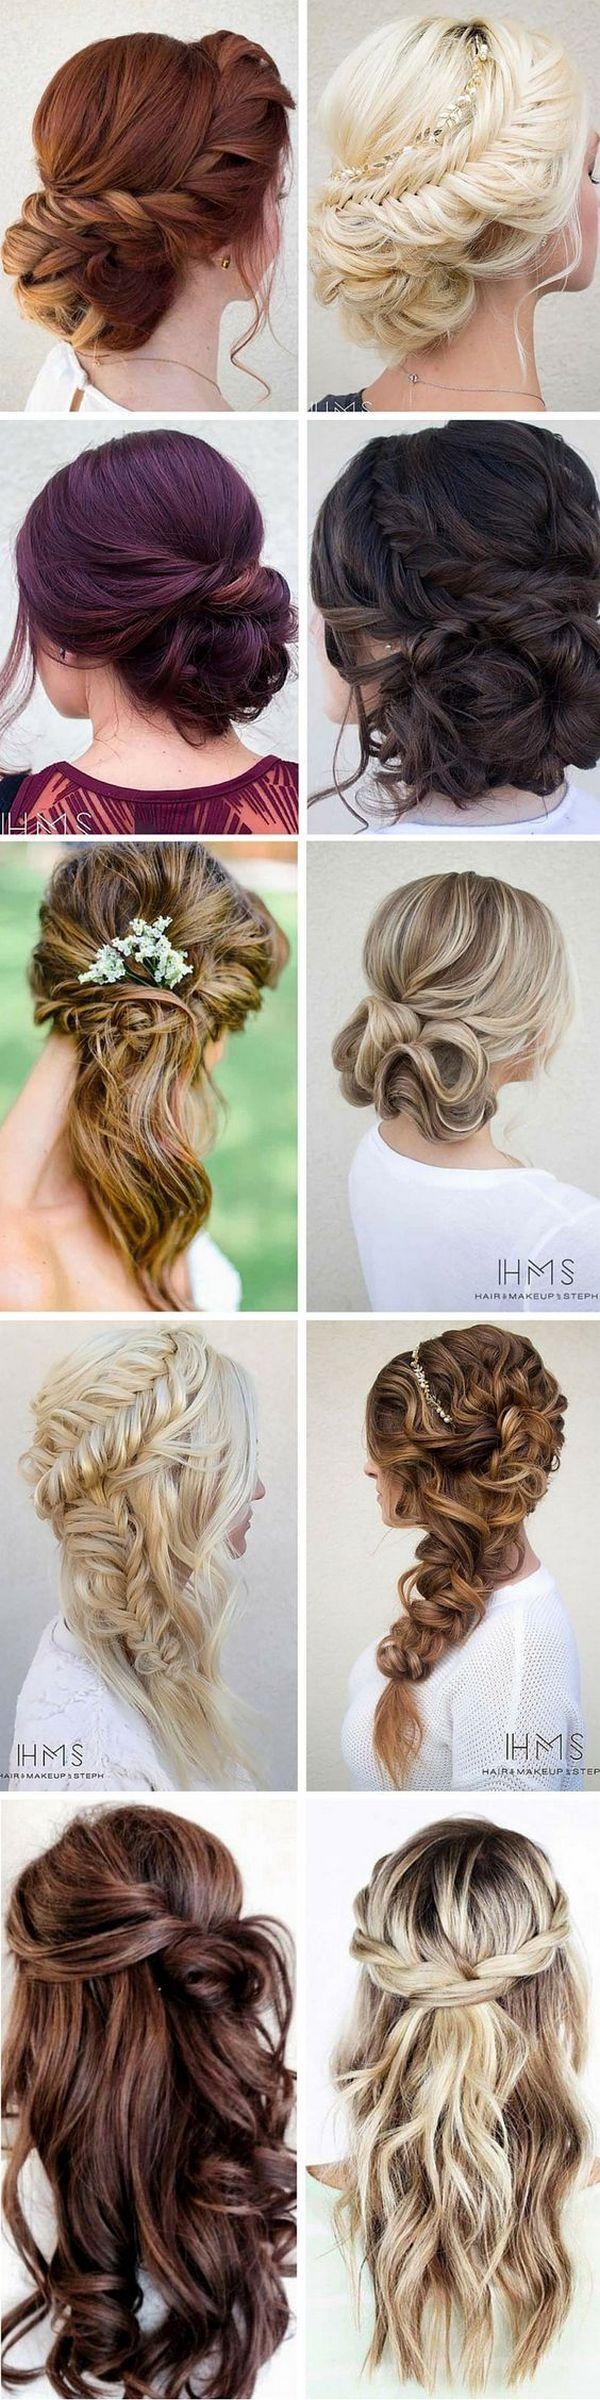 Pleasing 1000 Ideas About Bridesmaids Hairstyles On Pinterest Junior Hairstyles For Women Draintrainus